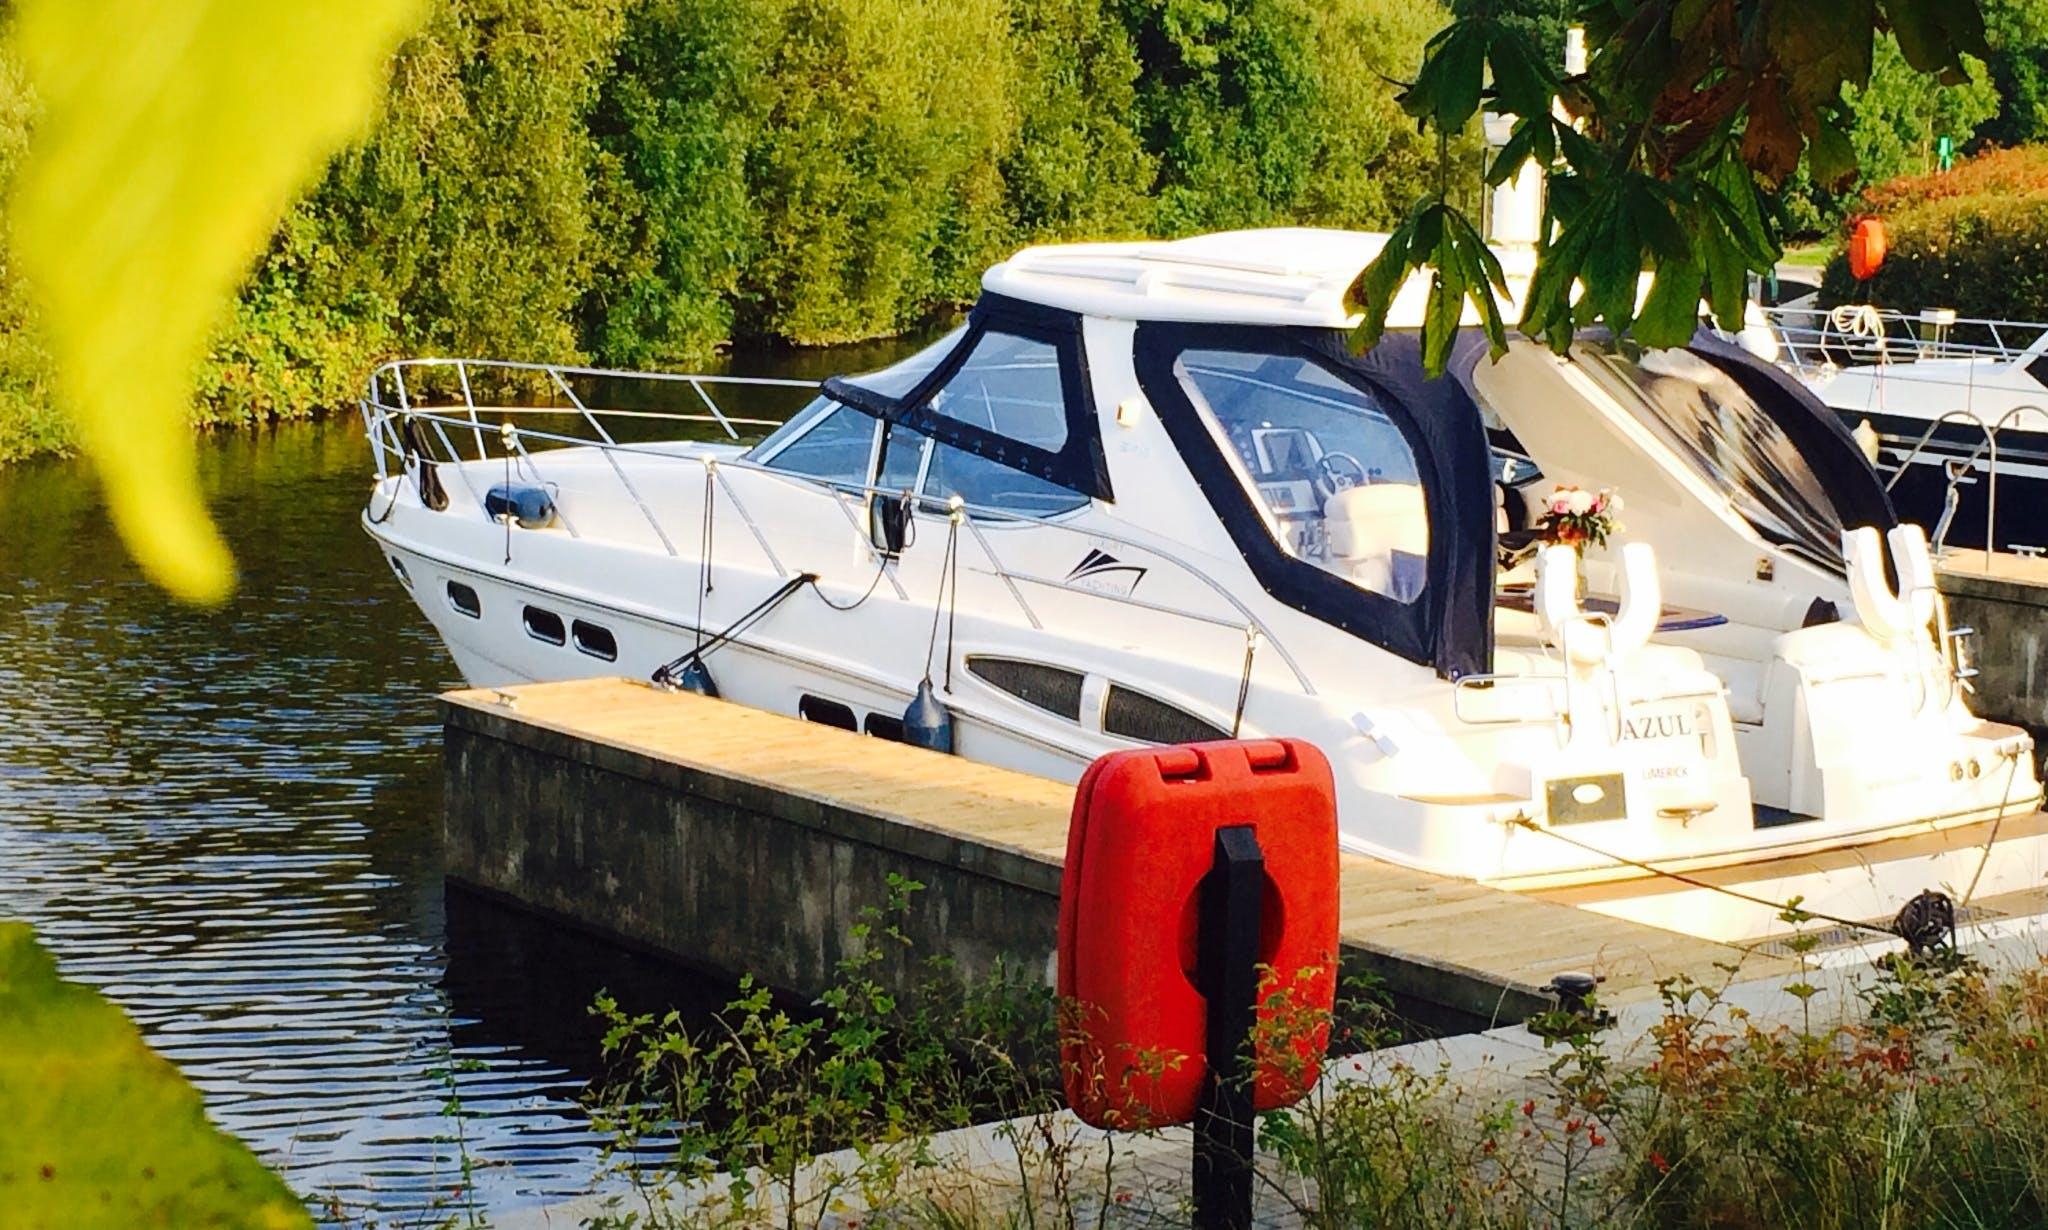 Luxury Motor Yacht Charter to Tour Killaloe